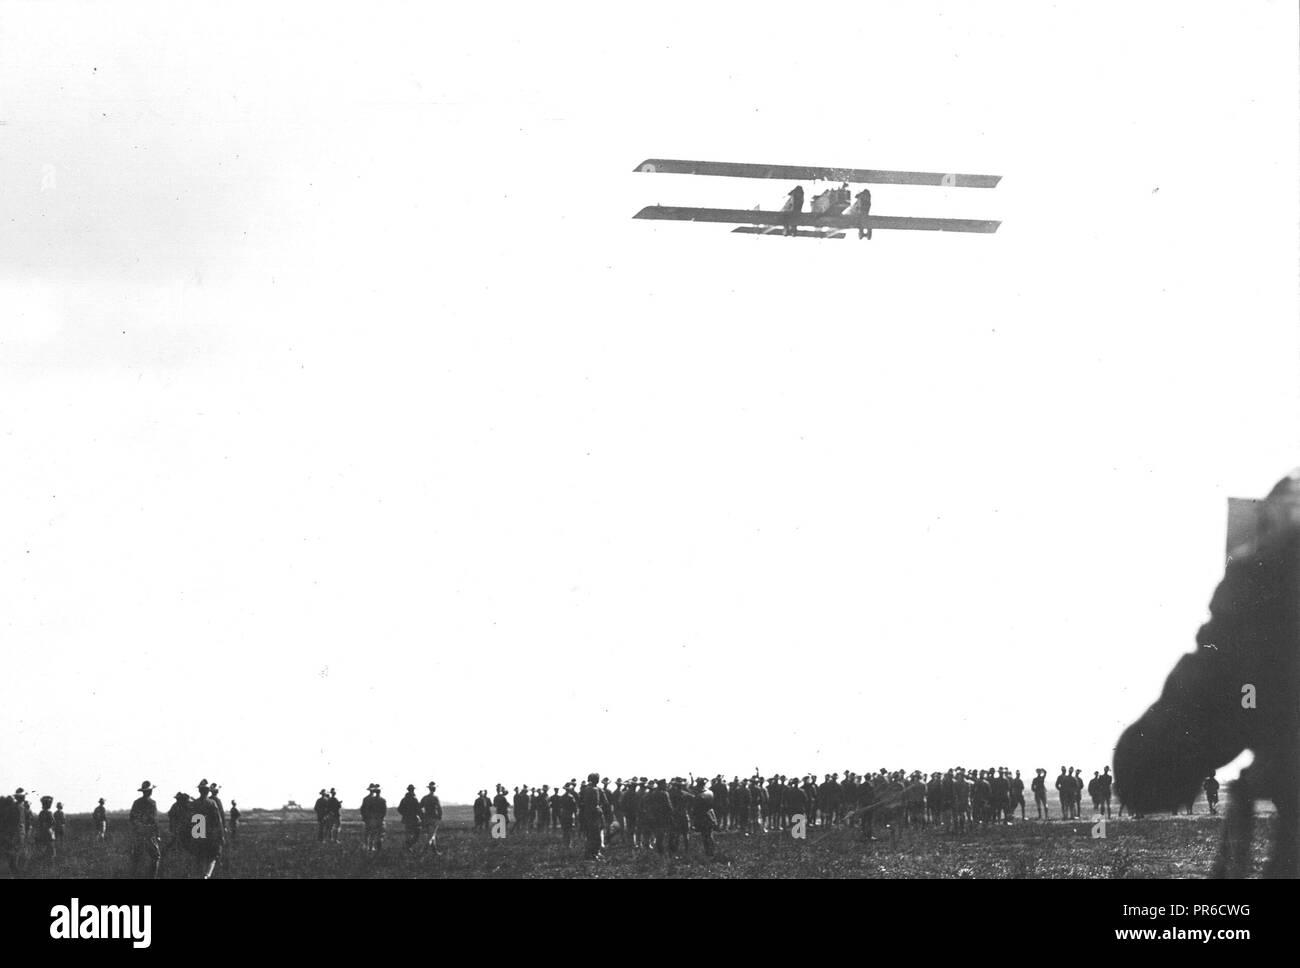 Hazelhurst Field, Mineola, L.I. Caproni bombing plane on its trial flight - Stock Image